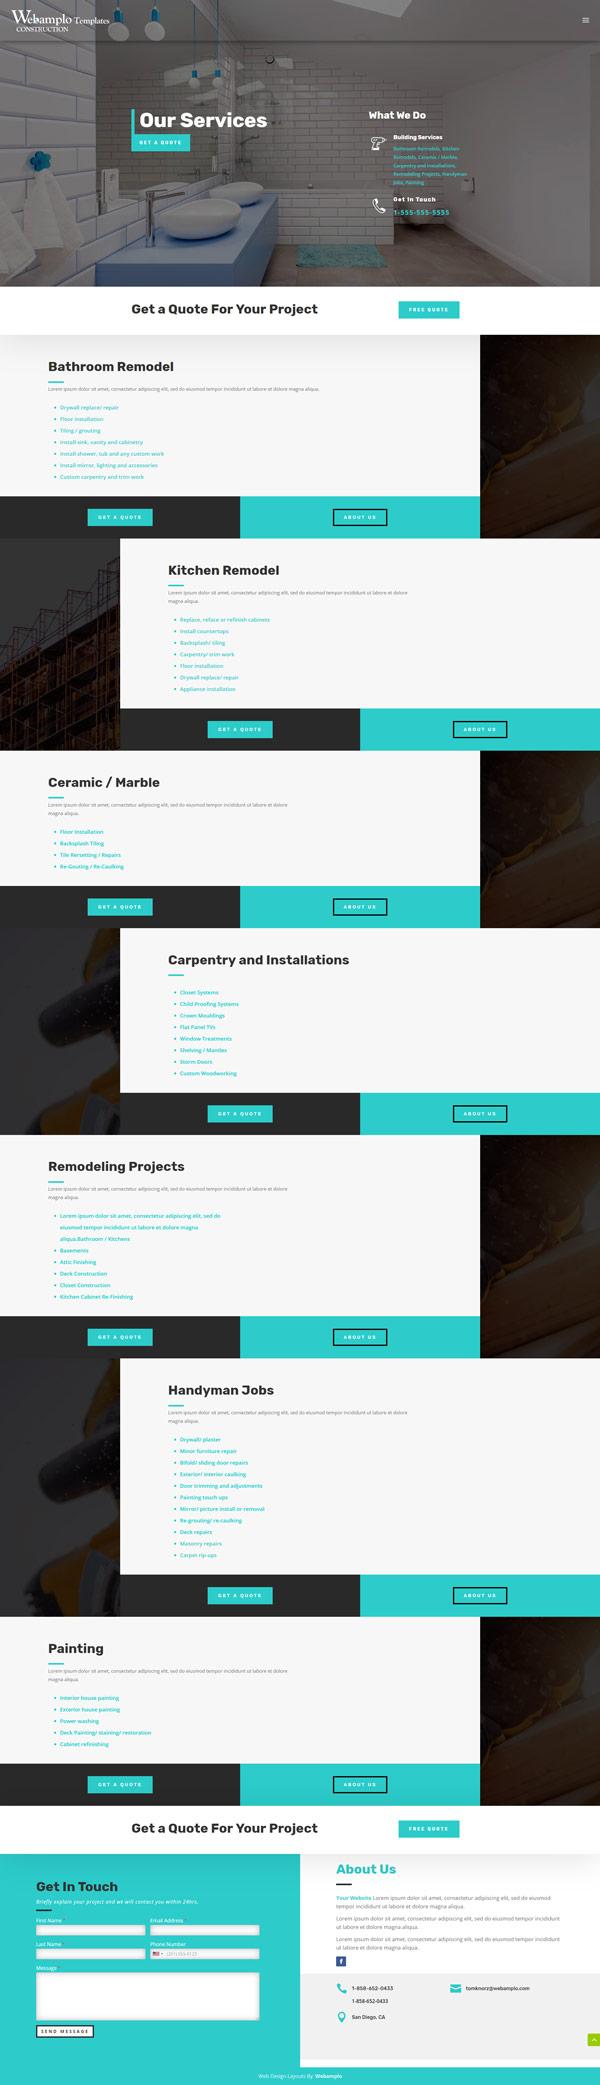 Construction Website Design About